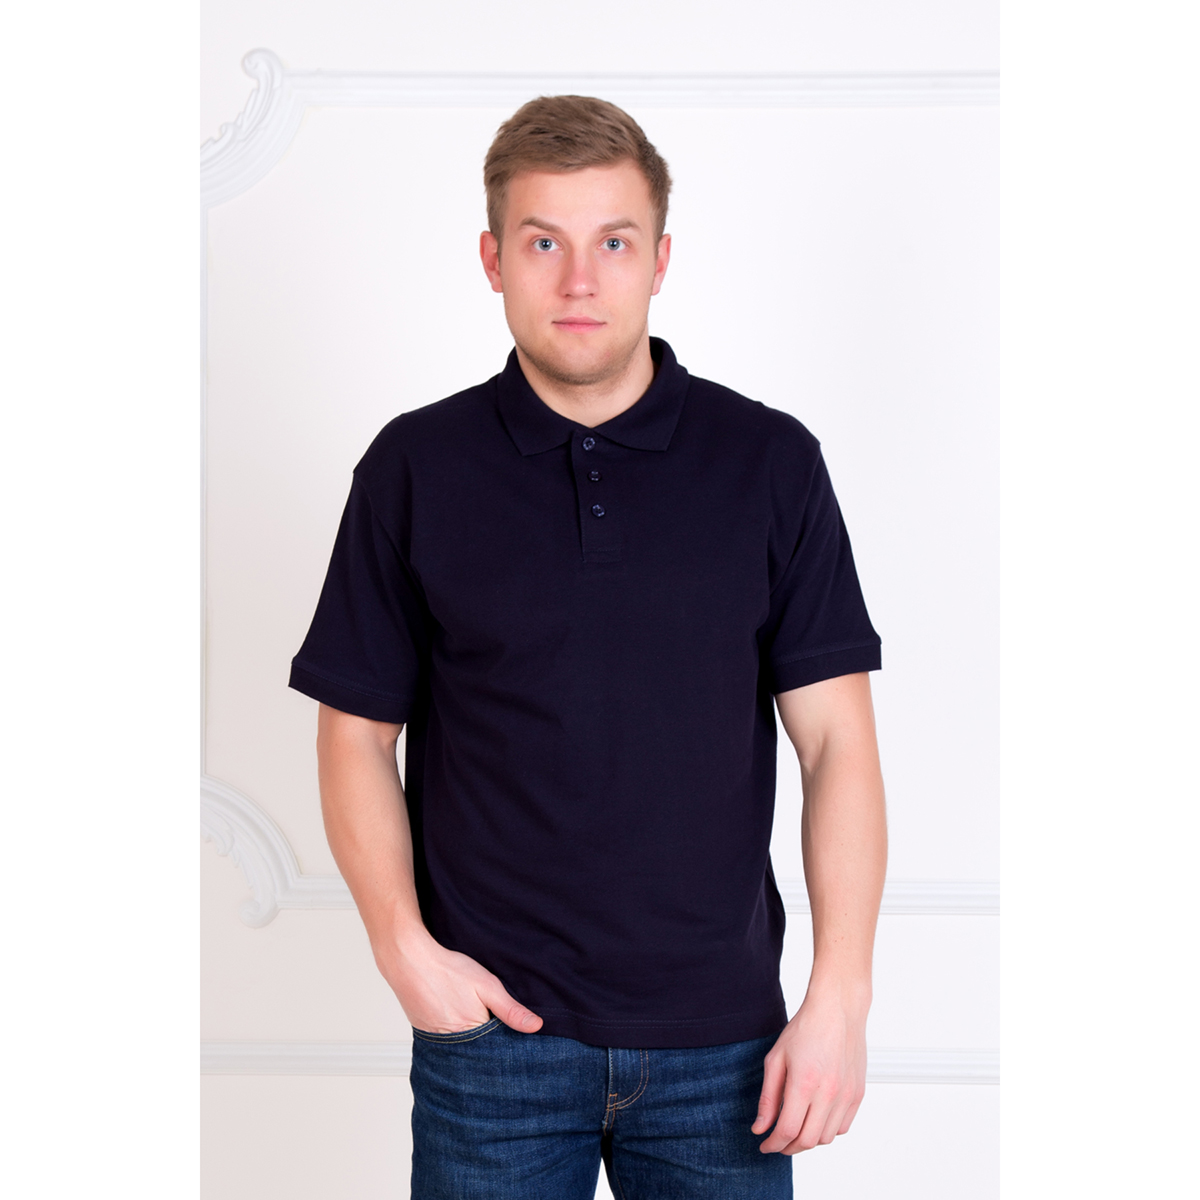 Мужская футболка-поло Макс Синий, размер 44Майки и футболки<br>Обхват груди:88 см<br>Обхват талии:78 см<br>Обхват бедер:94 см<br>Рост:170-176 см<br><br>Тип: Муж. футболка<br>Размер: 44<br>Материал: Пике